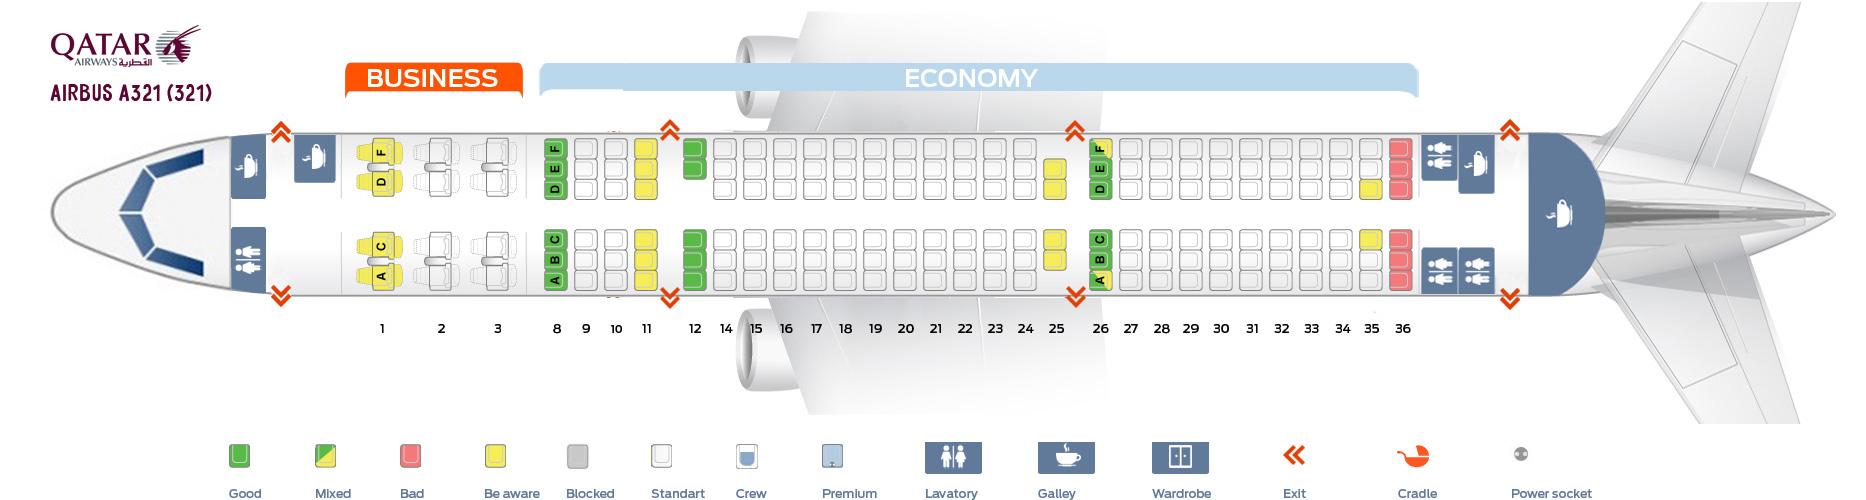 Seat Map Airbus A321-200 Qatar Airways